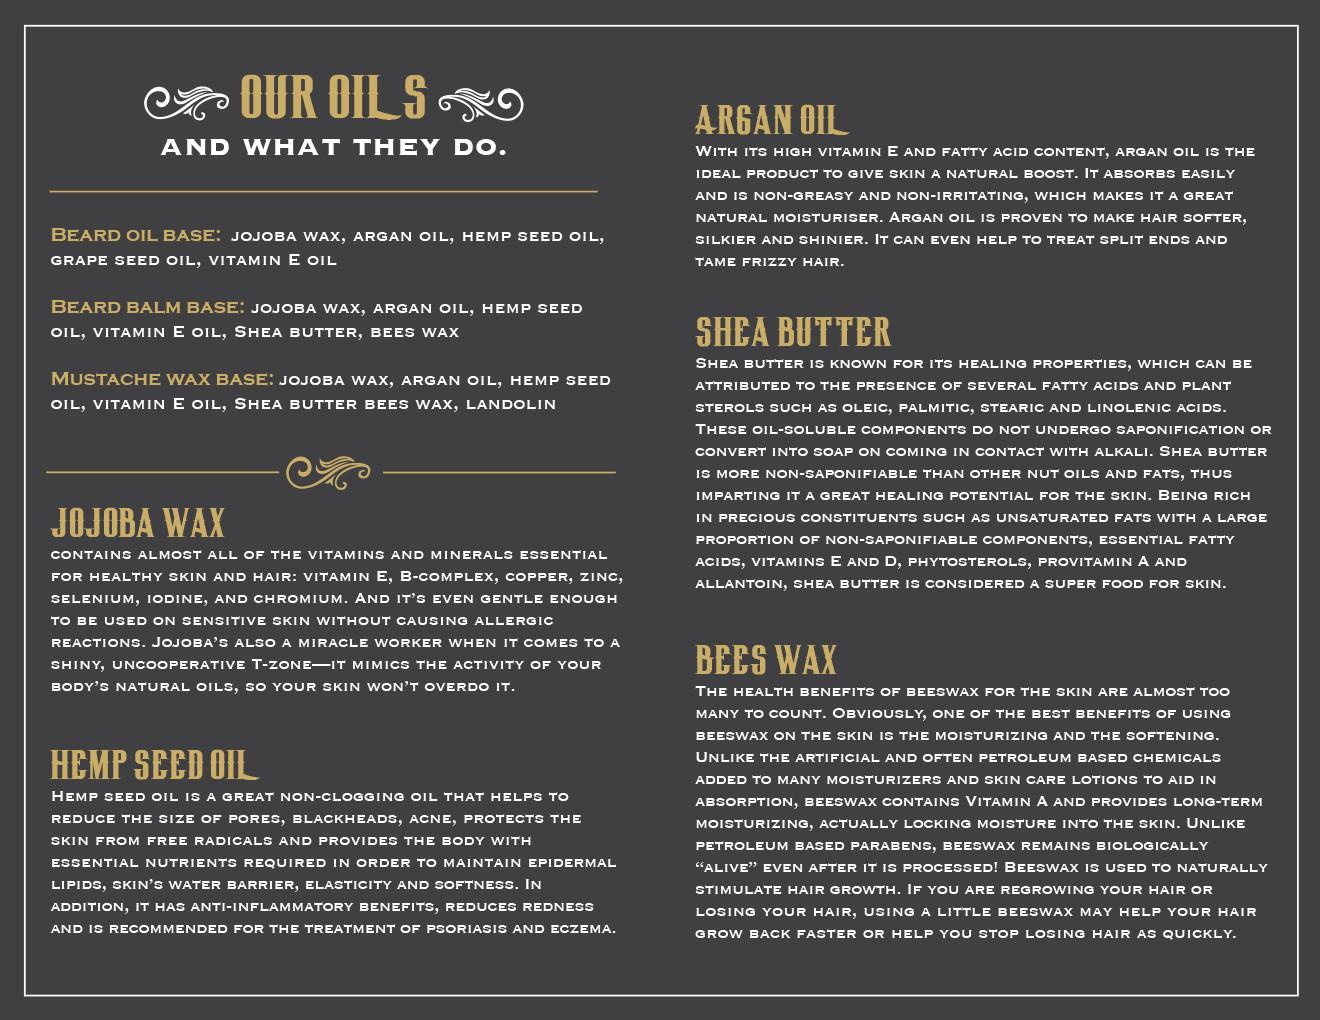 oil-brochure-2.jpg